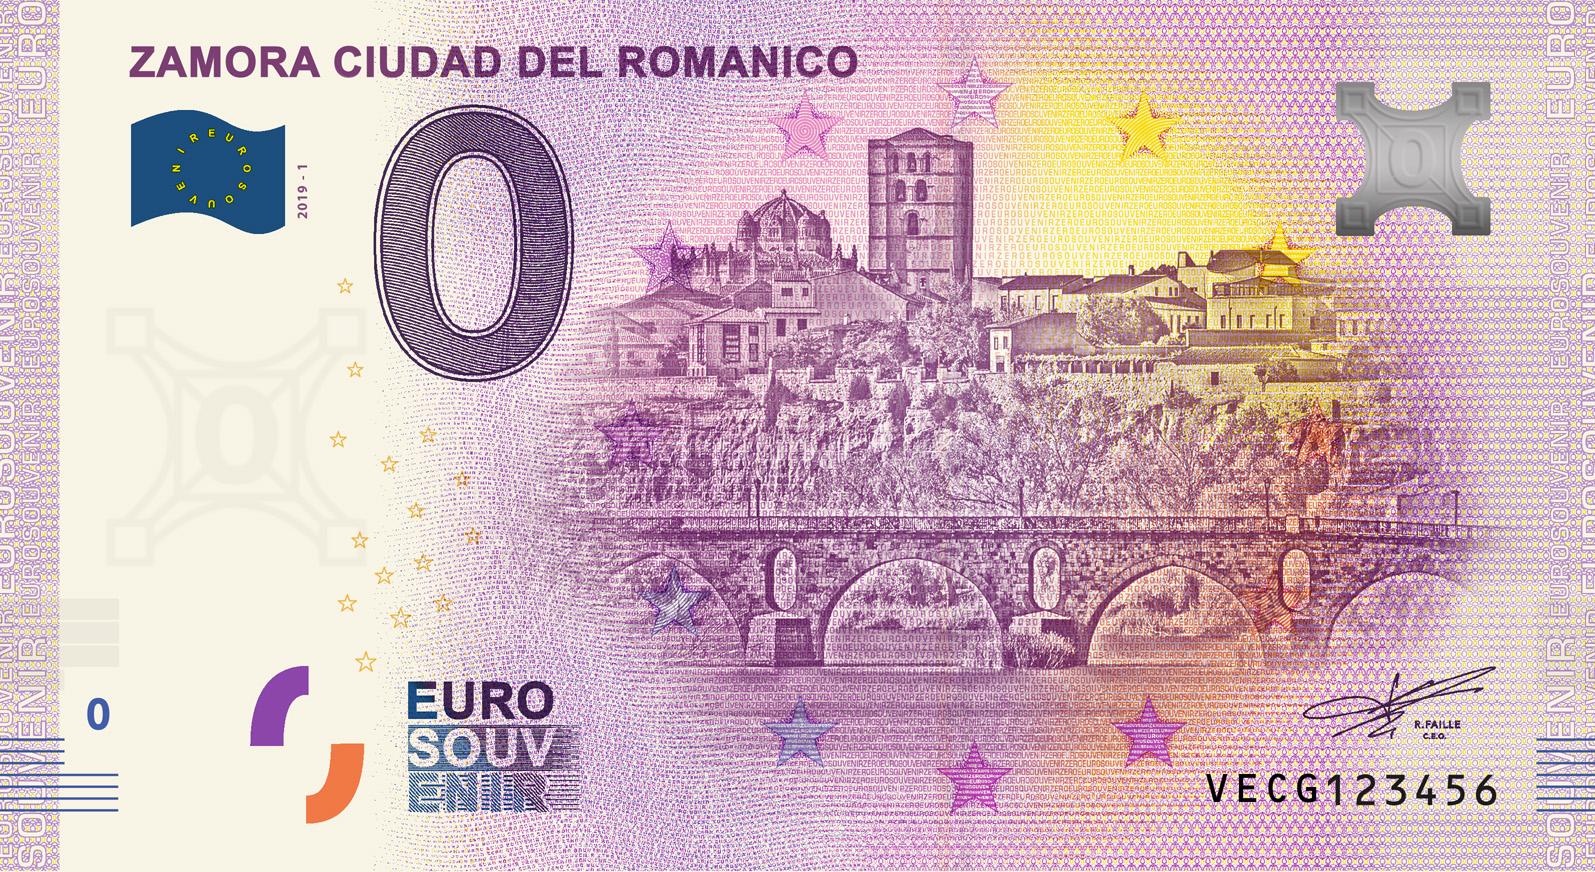 FRA_VECG1_Zamora_Ciudad_del_Romanico_2019.jpg